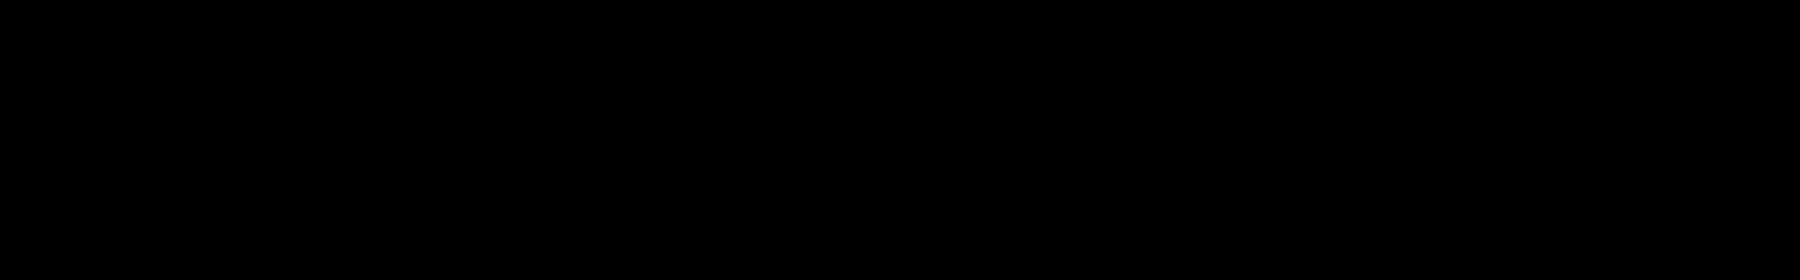 PSY-Bounce Songstarters audio waveform